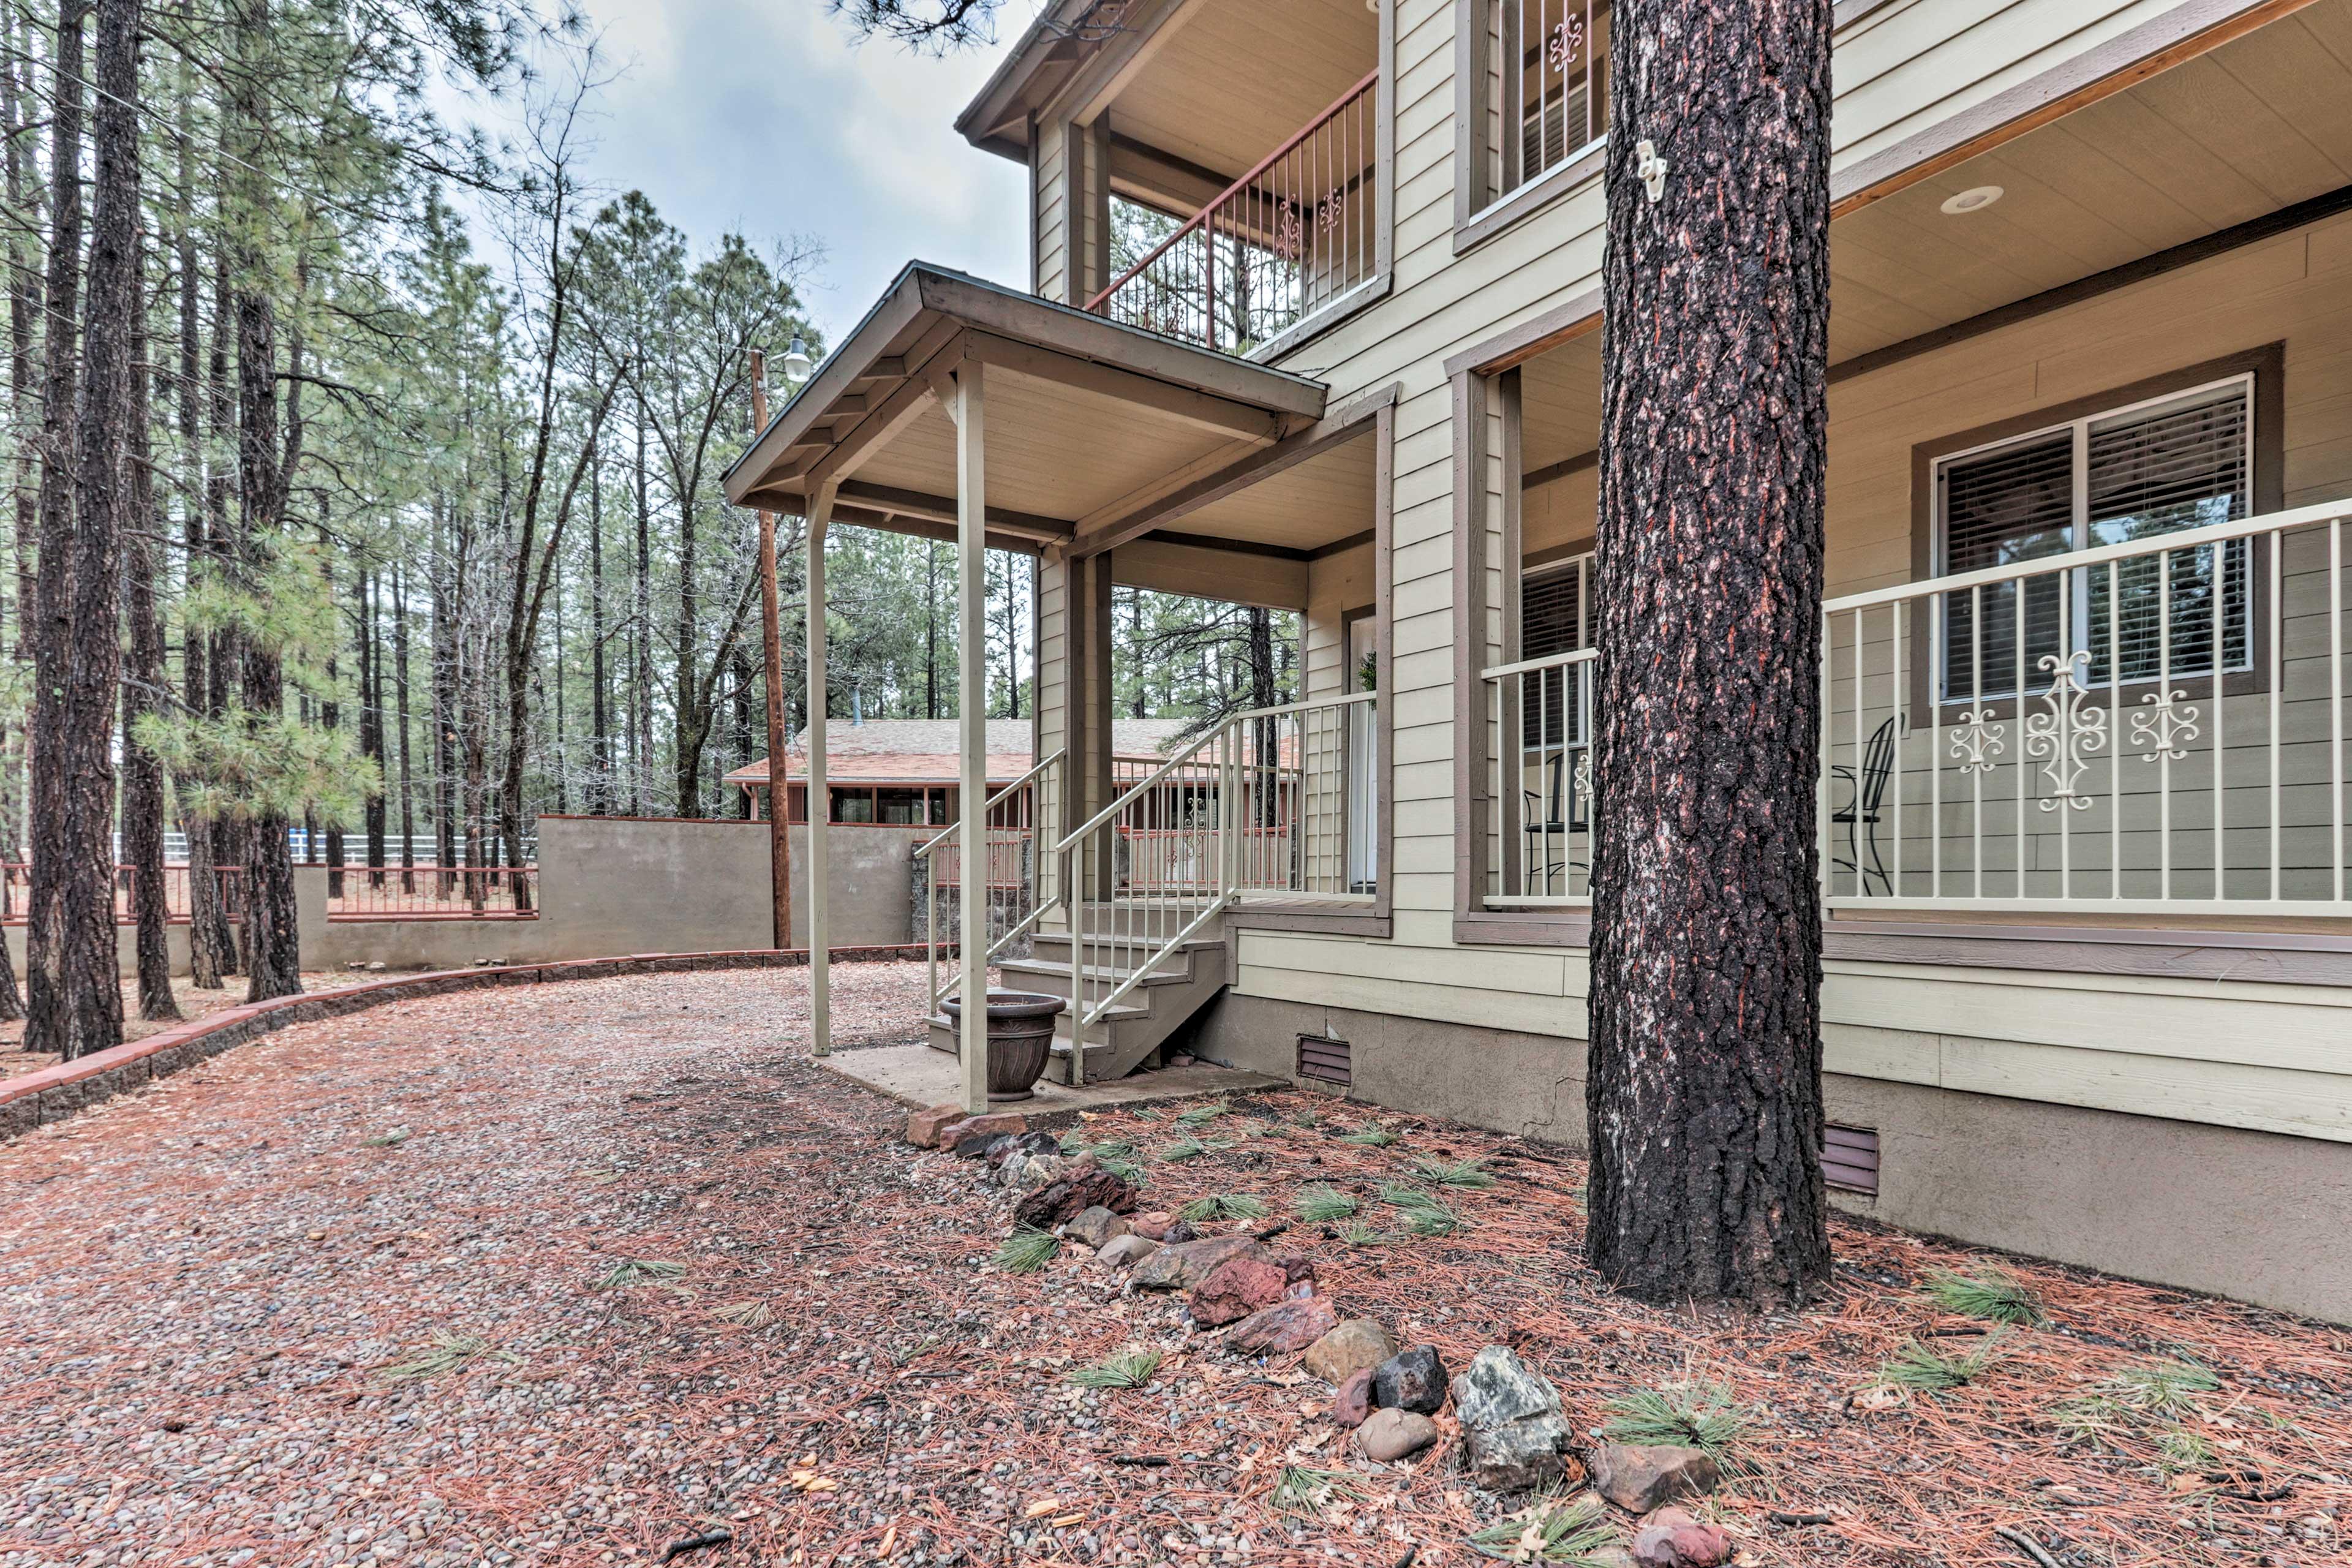 Ponderosa pines surround the house.